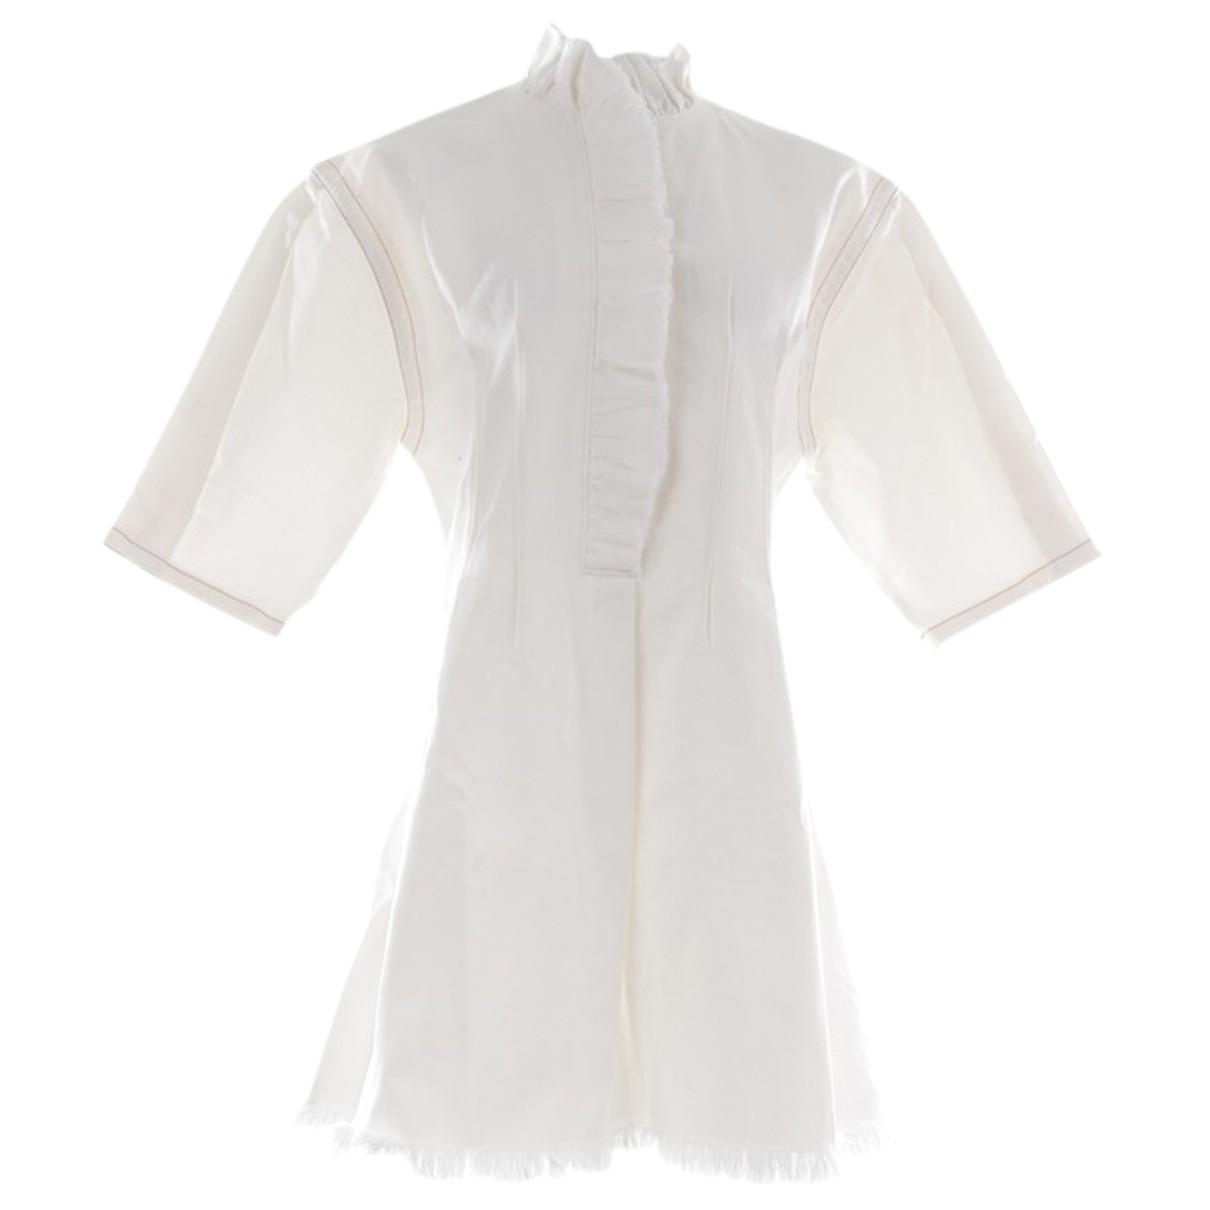 Sonia Rykiel N White Cotton dress for Women 40 FR